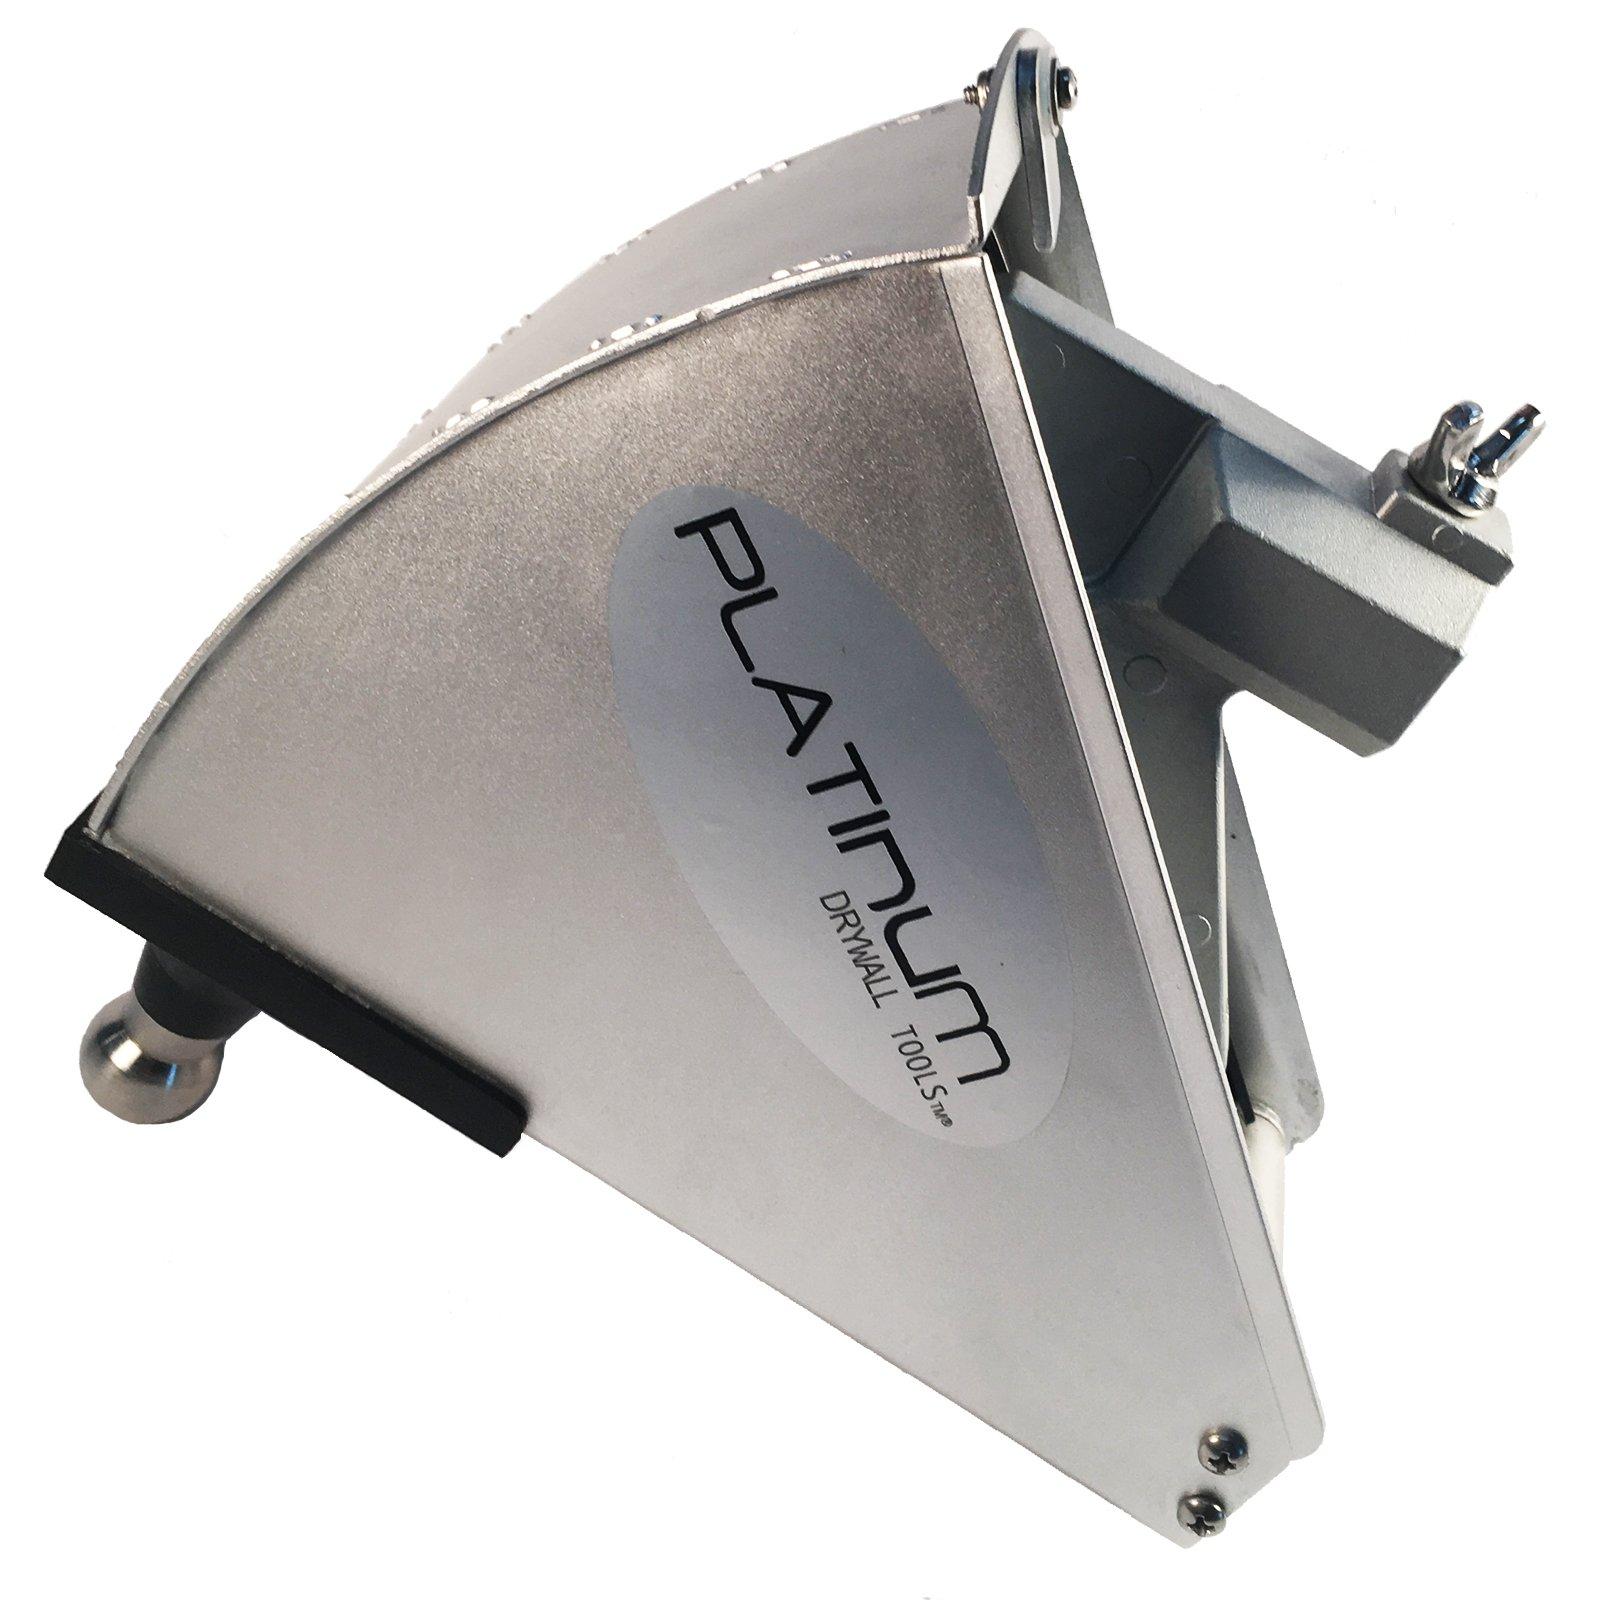 Platinum Drywall Tools 8'' Corner Angle Finisher Applicator Box